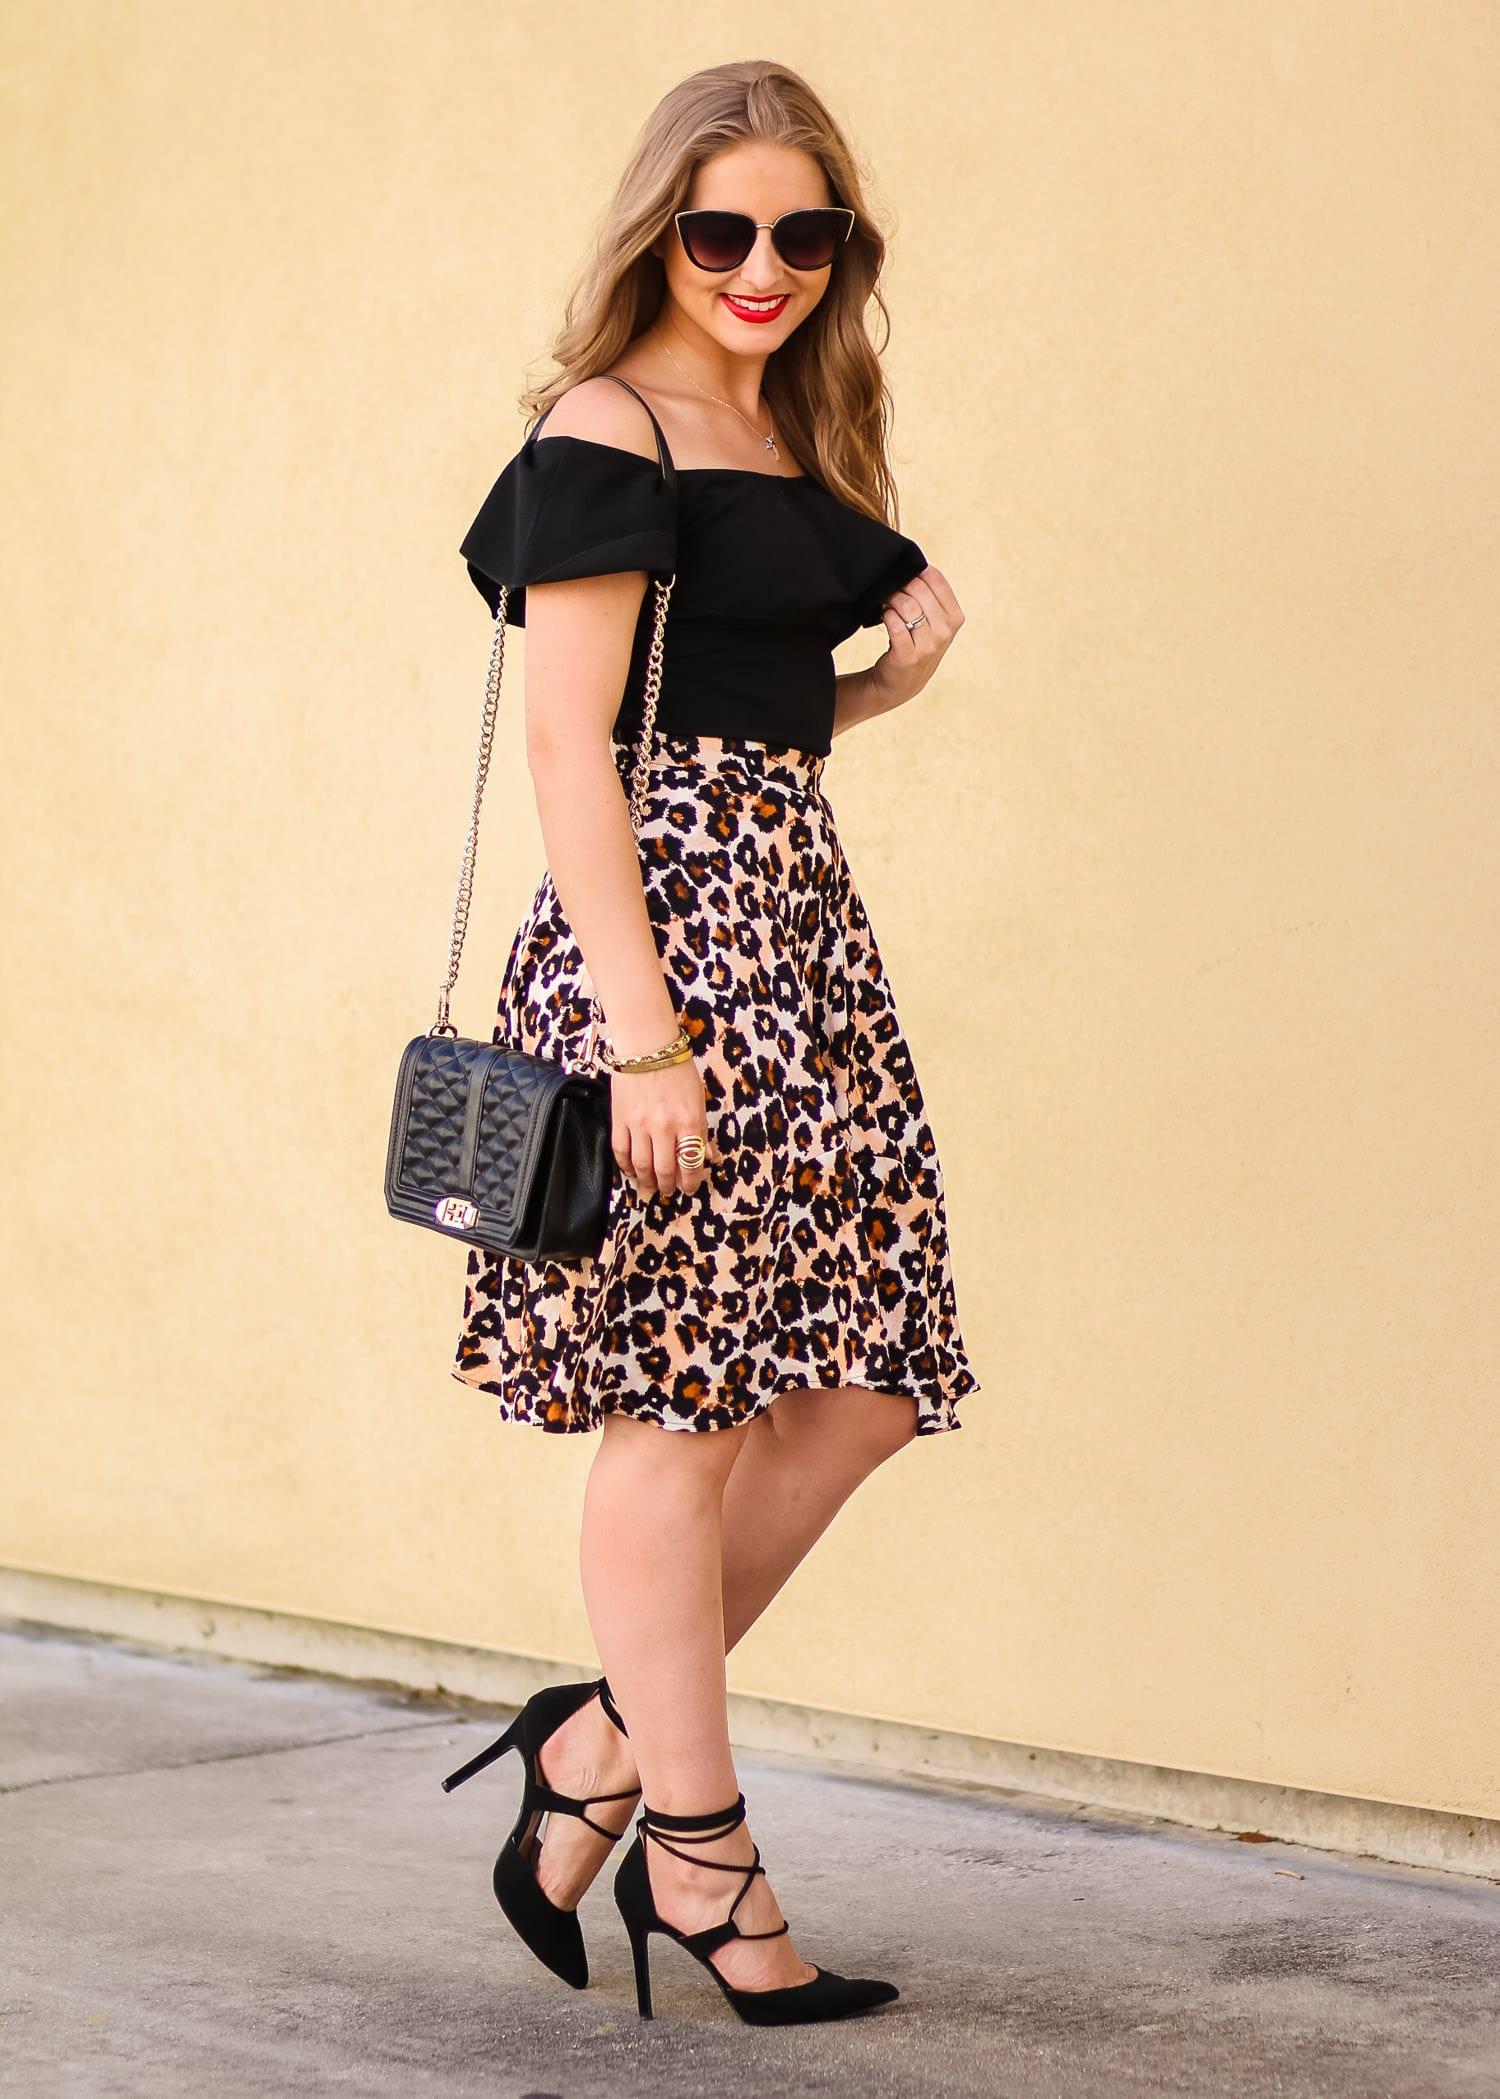 leopard-print-skirt-black-lace-up-heels-1045